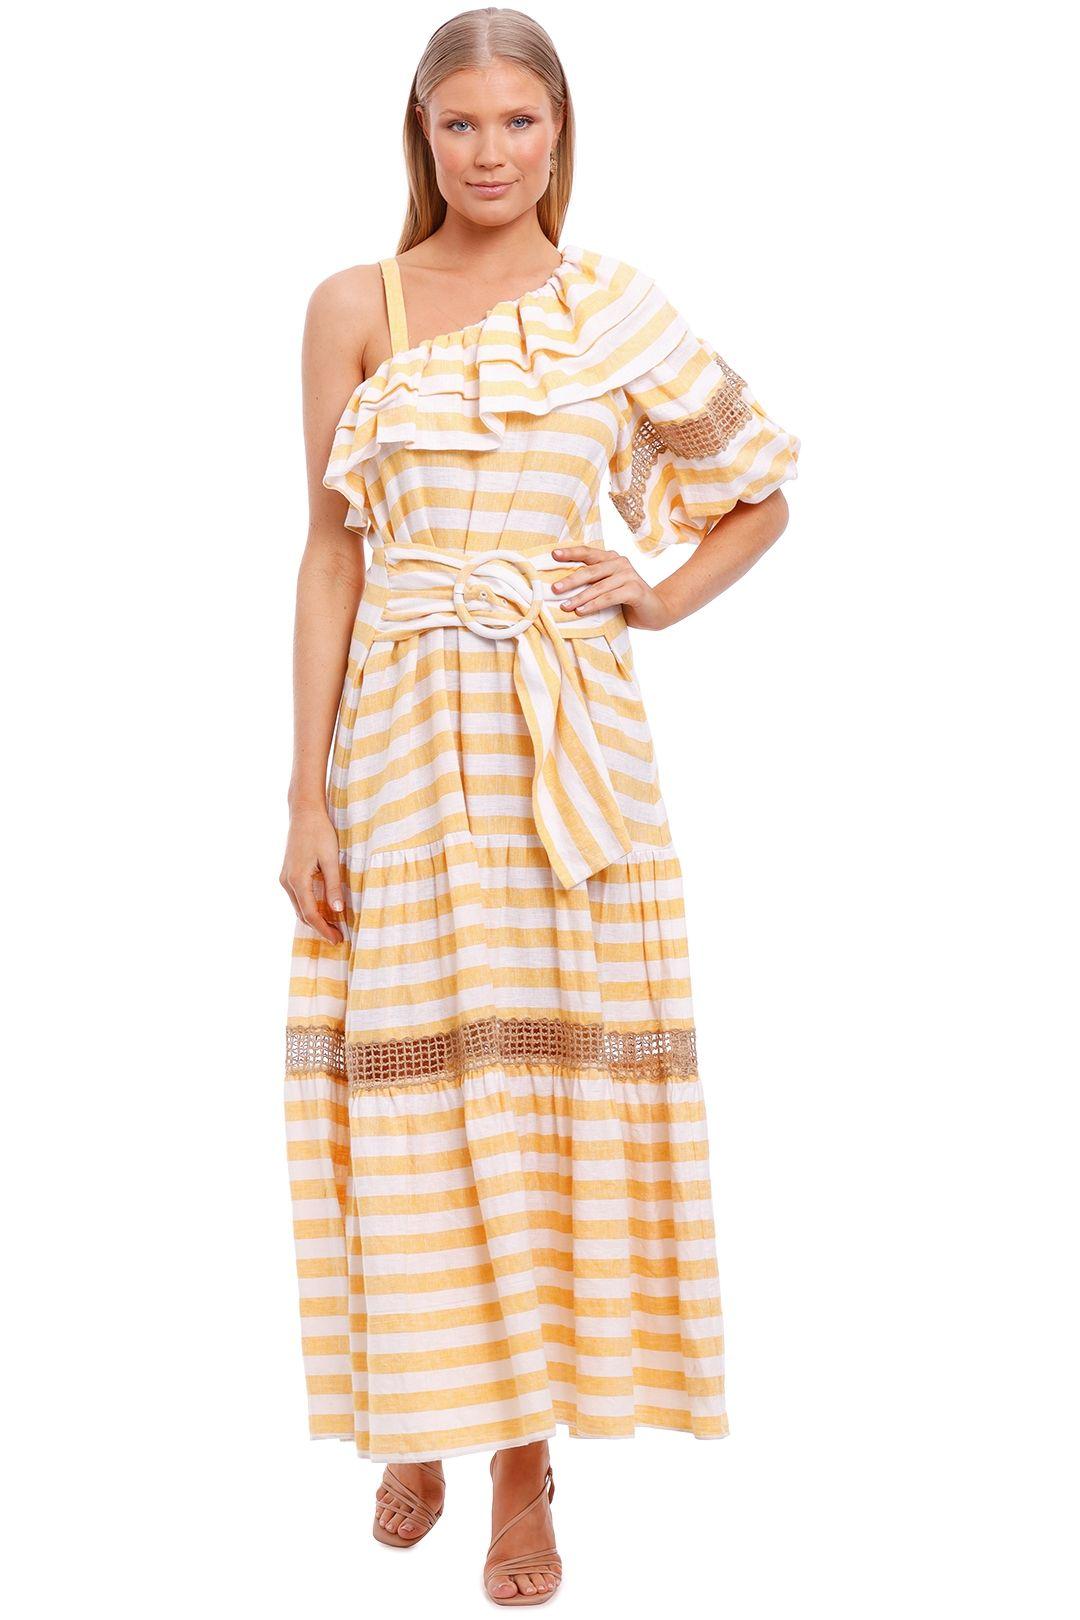 Trelise Cooper One Sided Love Dress